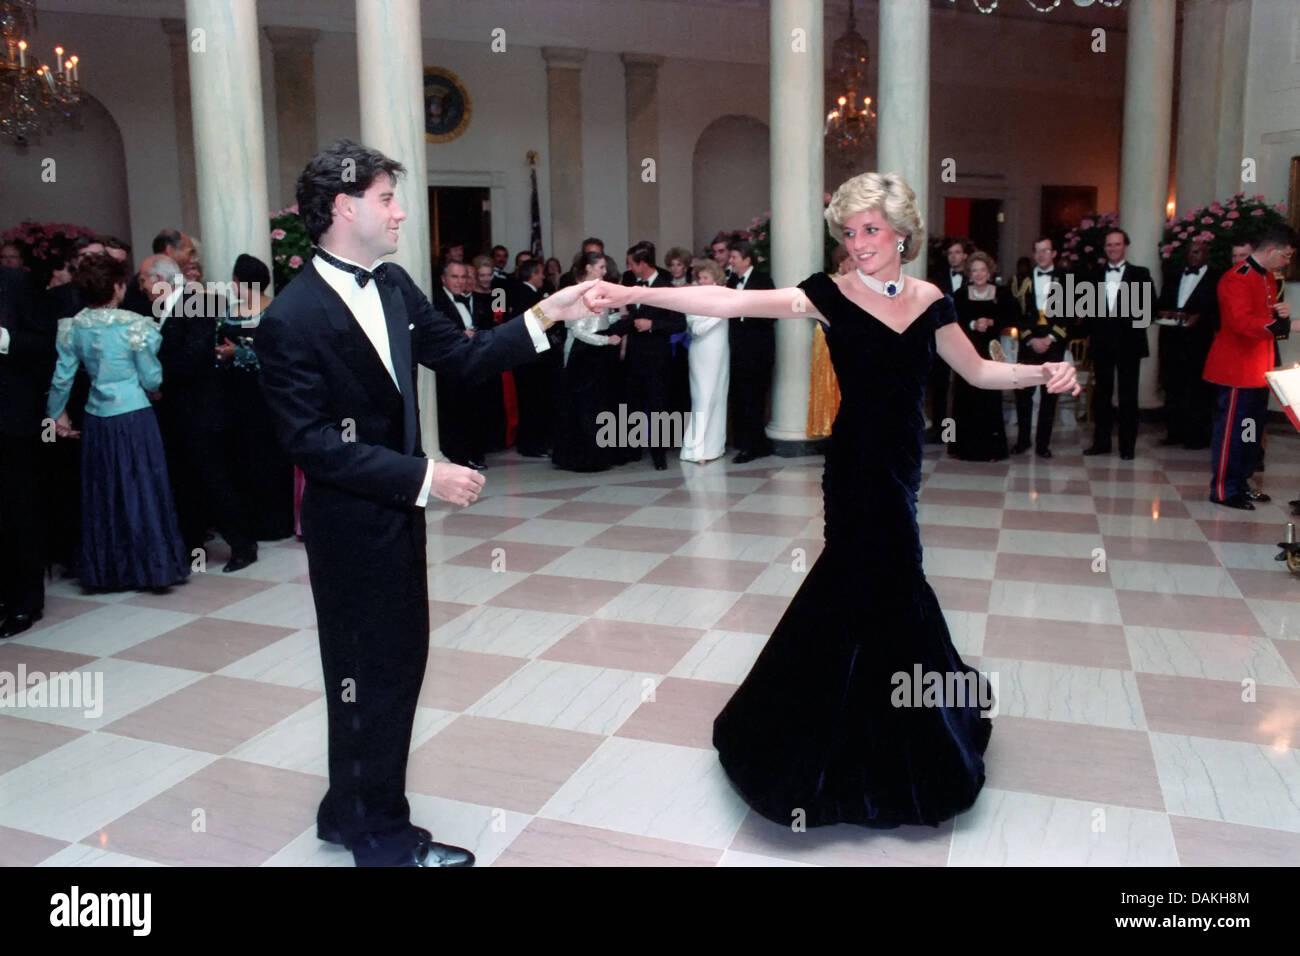 Diana, Princess of Wales dances with actor John Travolta during a White House Gala Dinner November 9, 1985 in Washington, - Stock Image